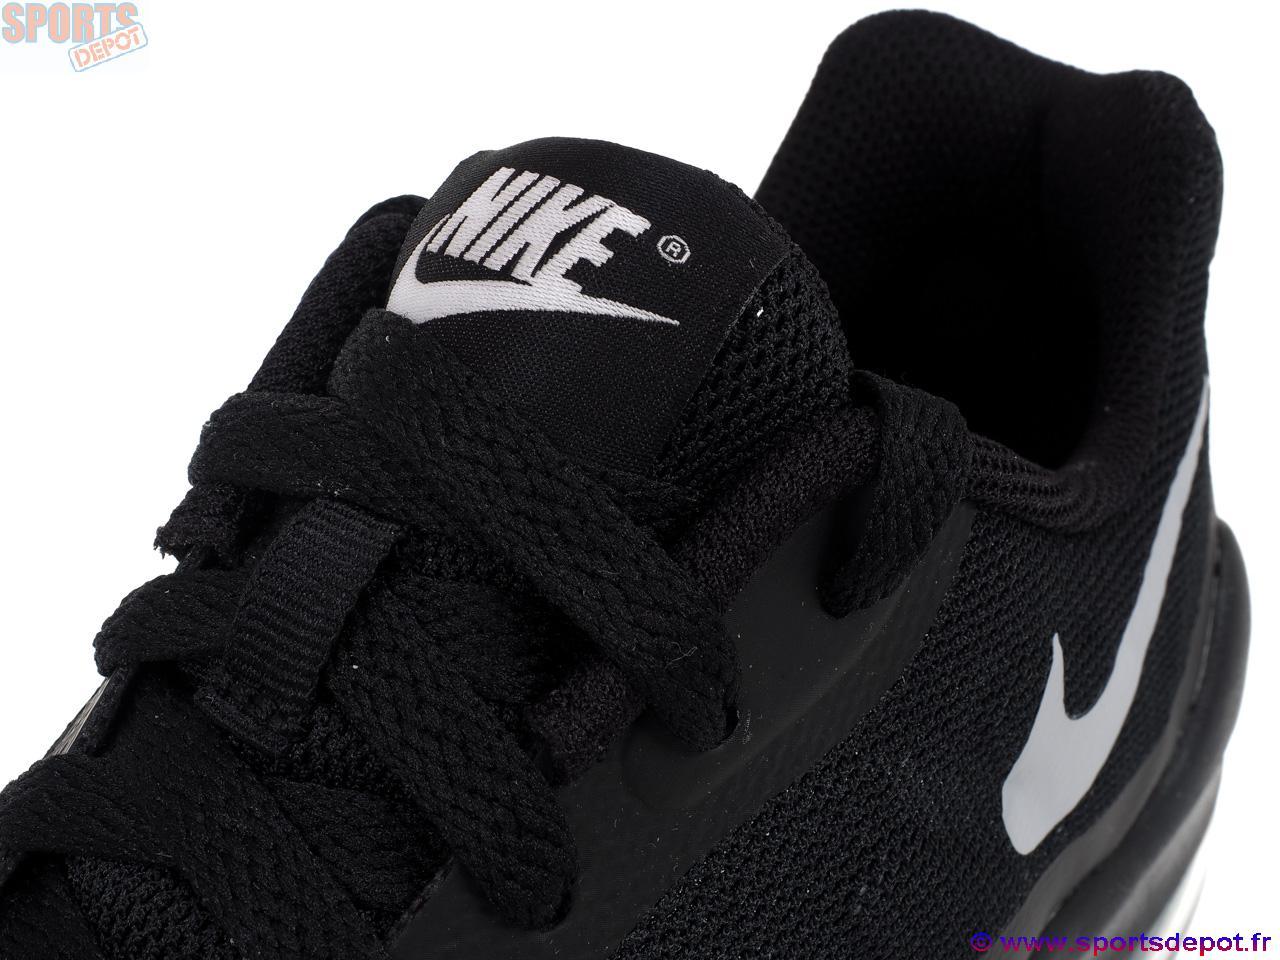 promo code da2d9 03d7e Mode Max Chaussures Ville Noir Nike Invigor Jr Air Enfant Acheter xSnPwTw